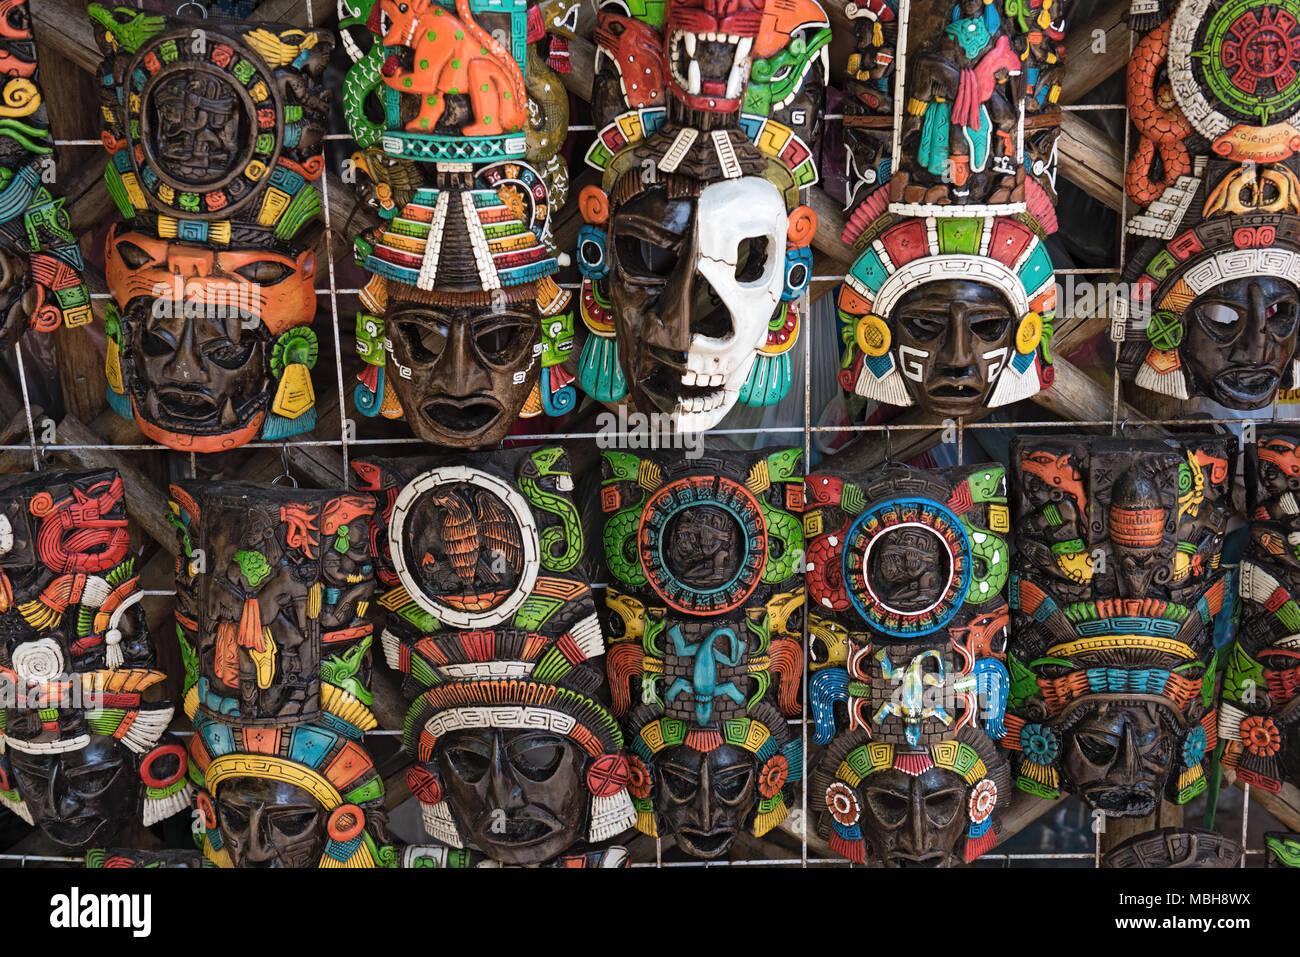 Colored wooden masks at a souvenir stand in Chichen Itza, Yucatan, Mexico - Stock Image